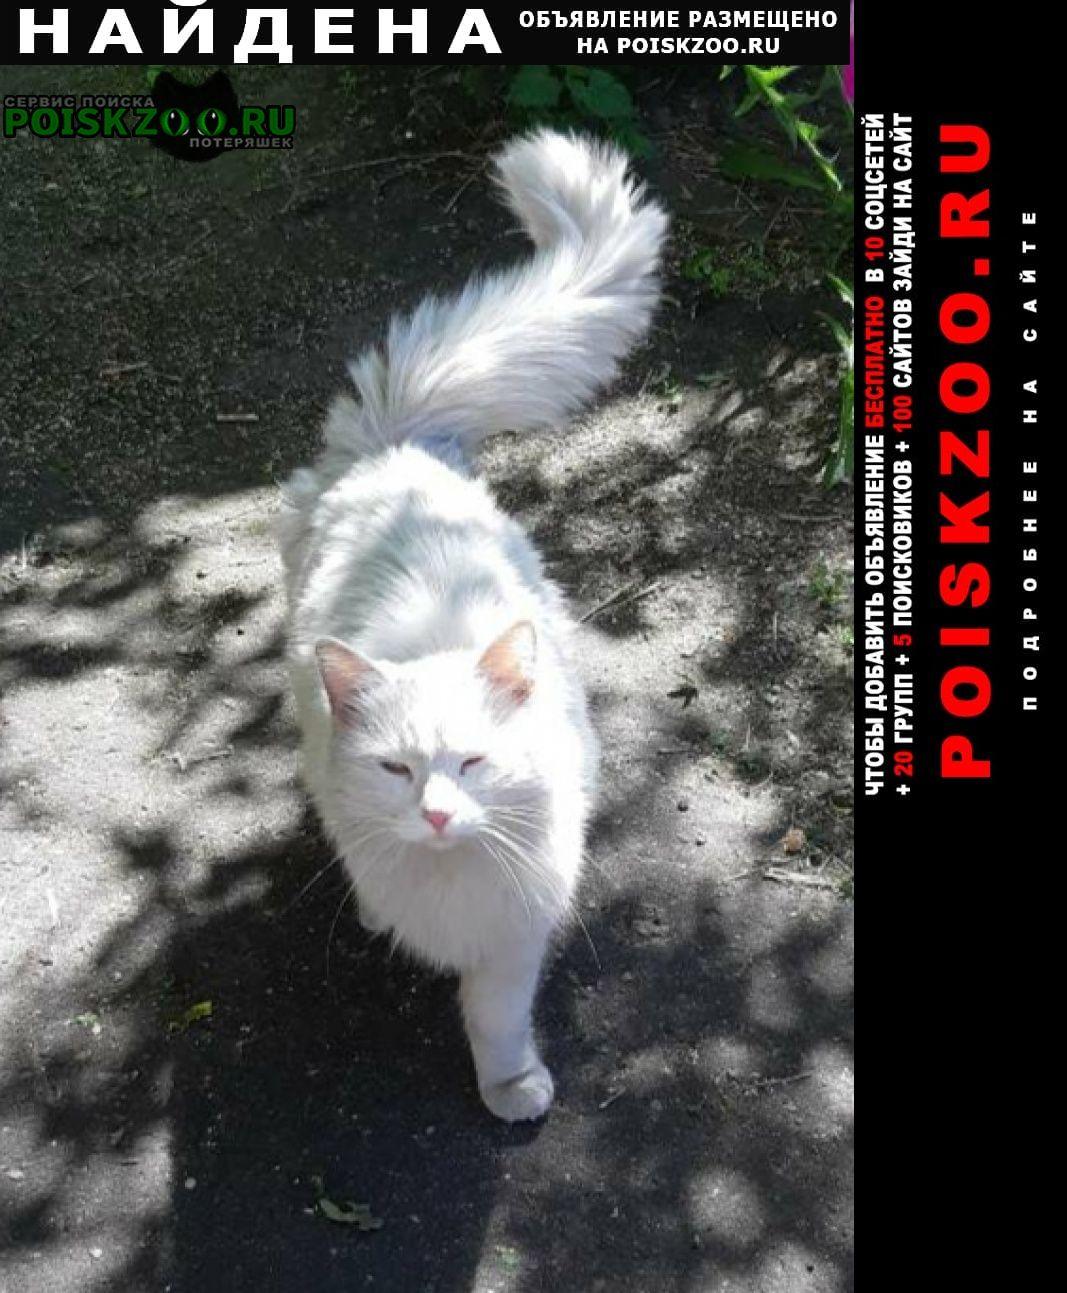 Найдена кошка Рыбинск